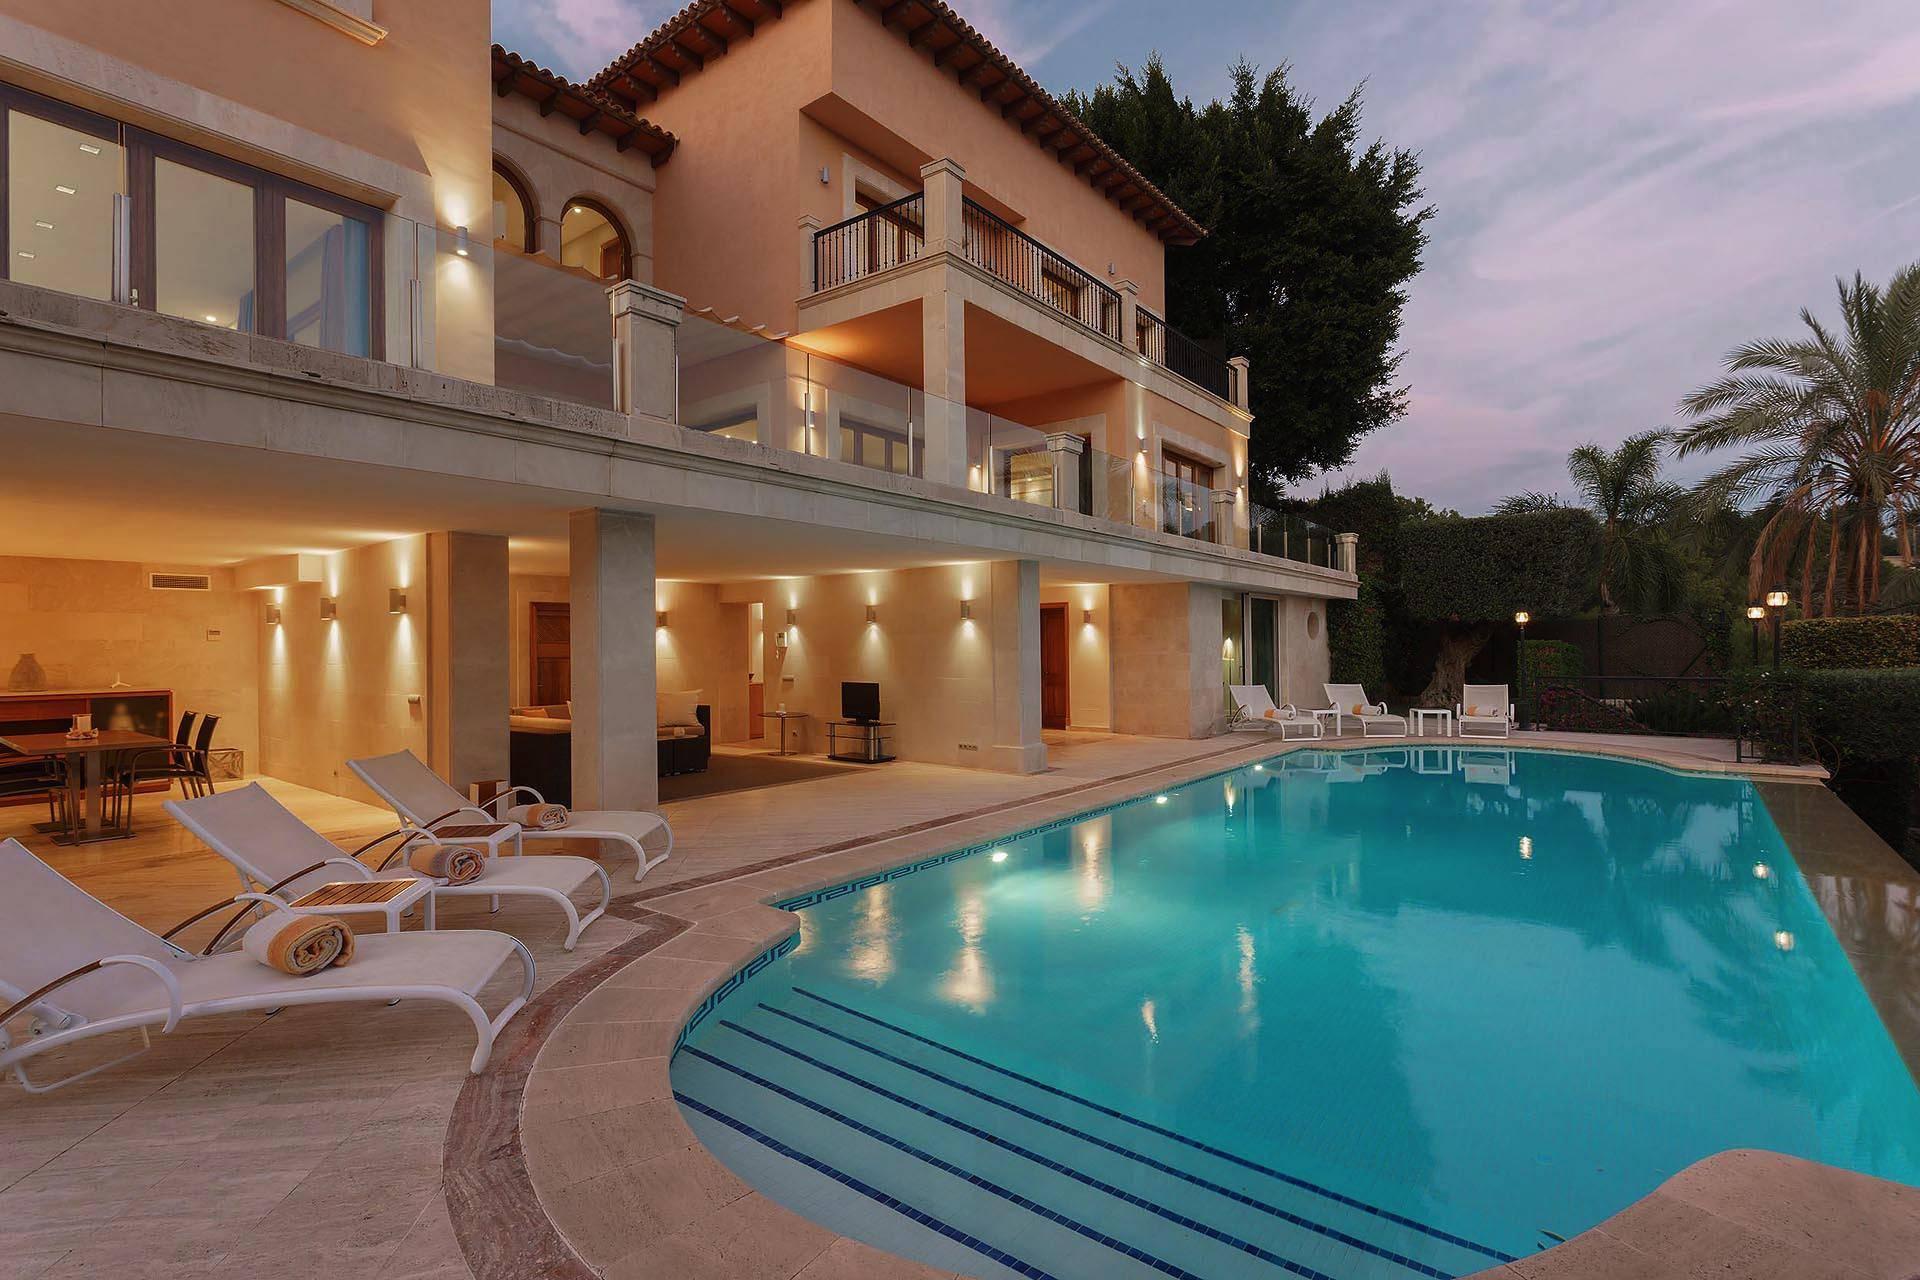 01-280 großzügige Villa nahe Palma de Mallorca Bild 15